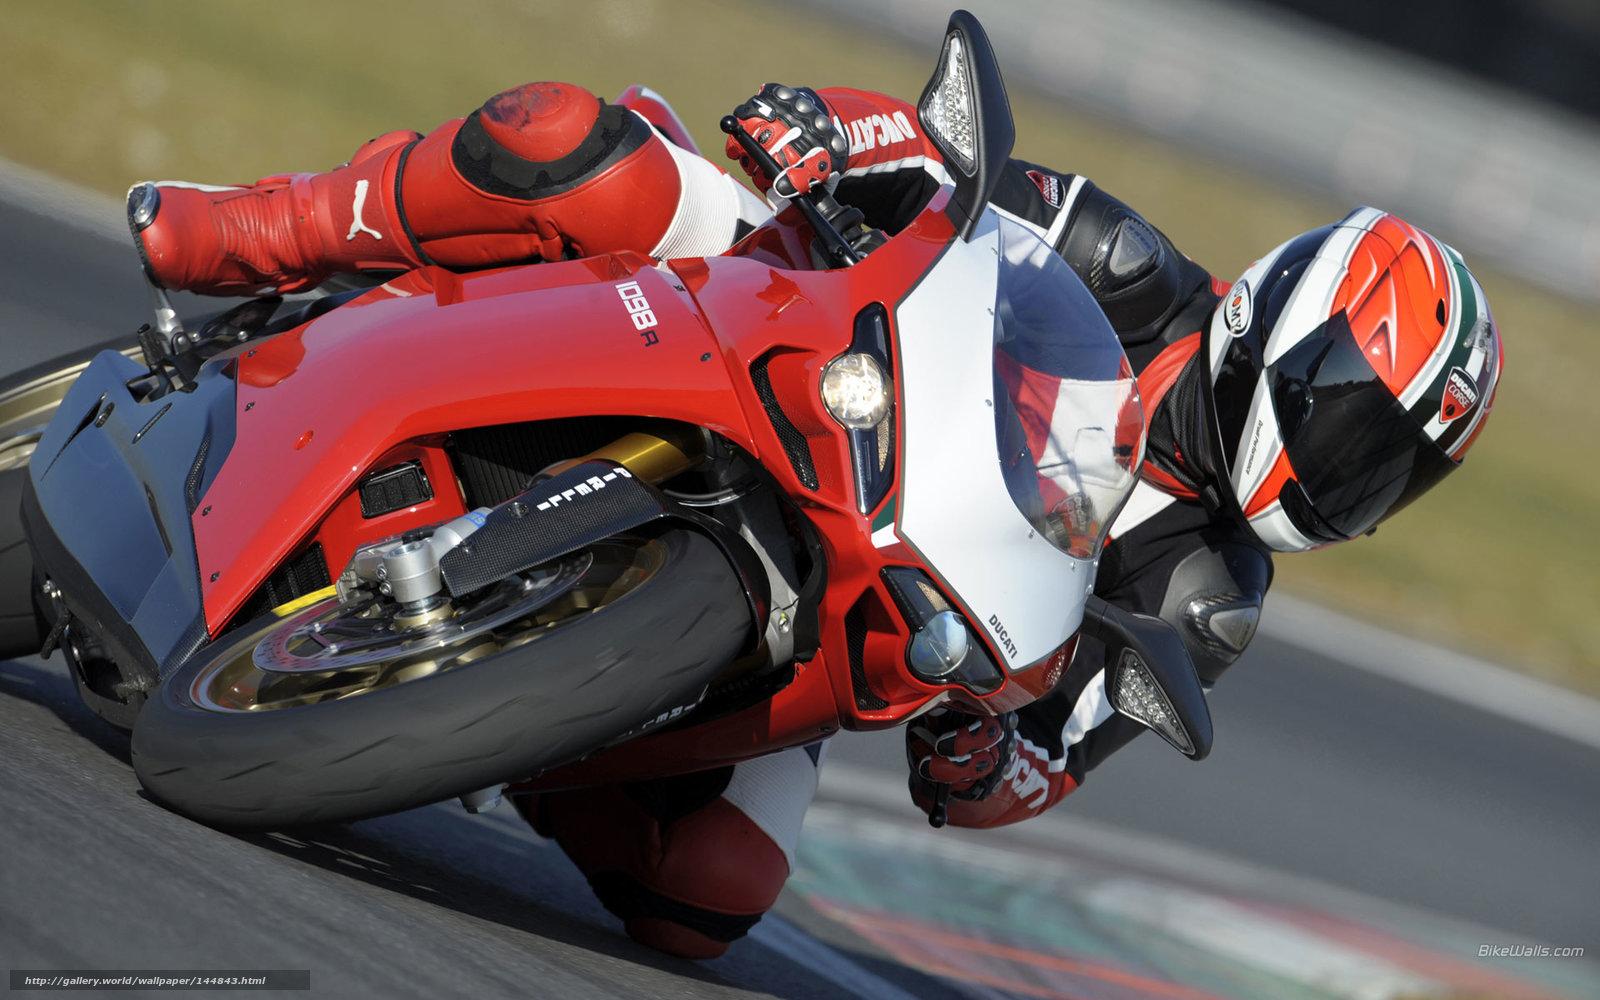 Tlcharger Fond d'ecran Ducati, SuperSport, 1098R, 1098R 2008 Fonds d ...